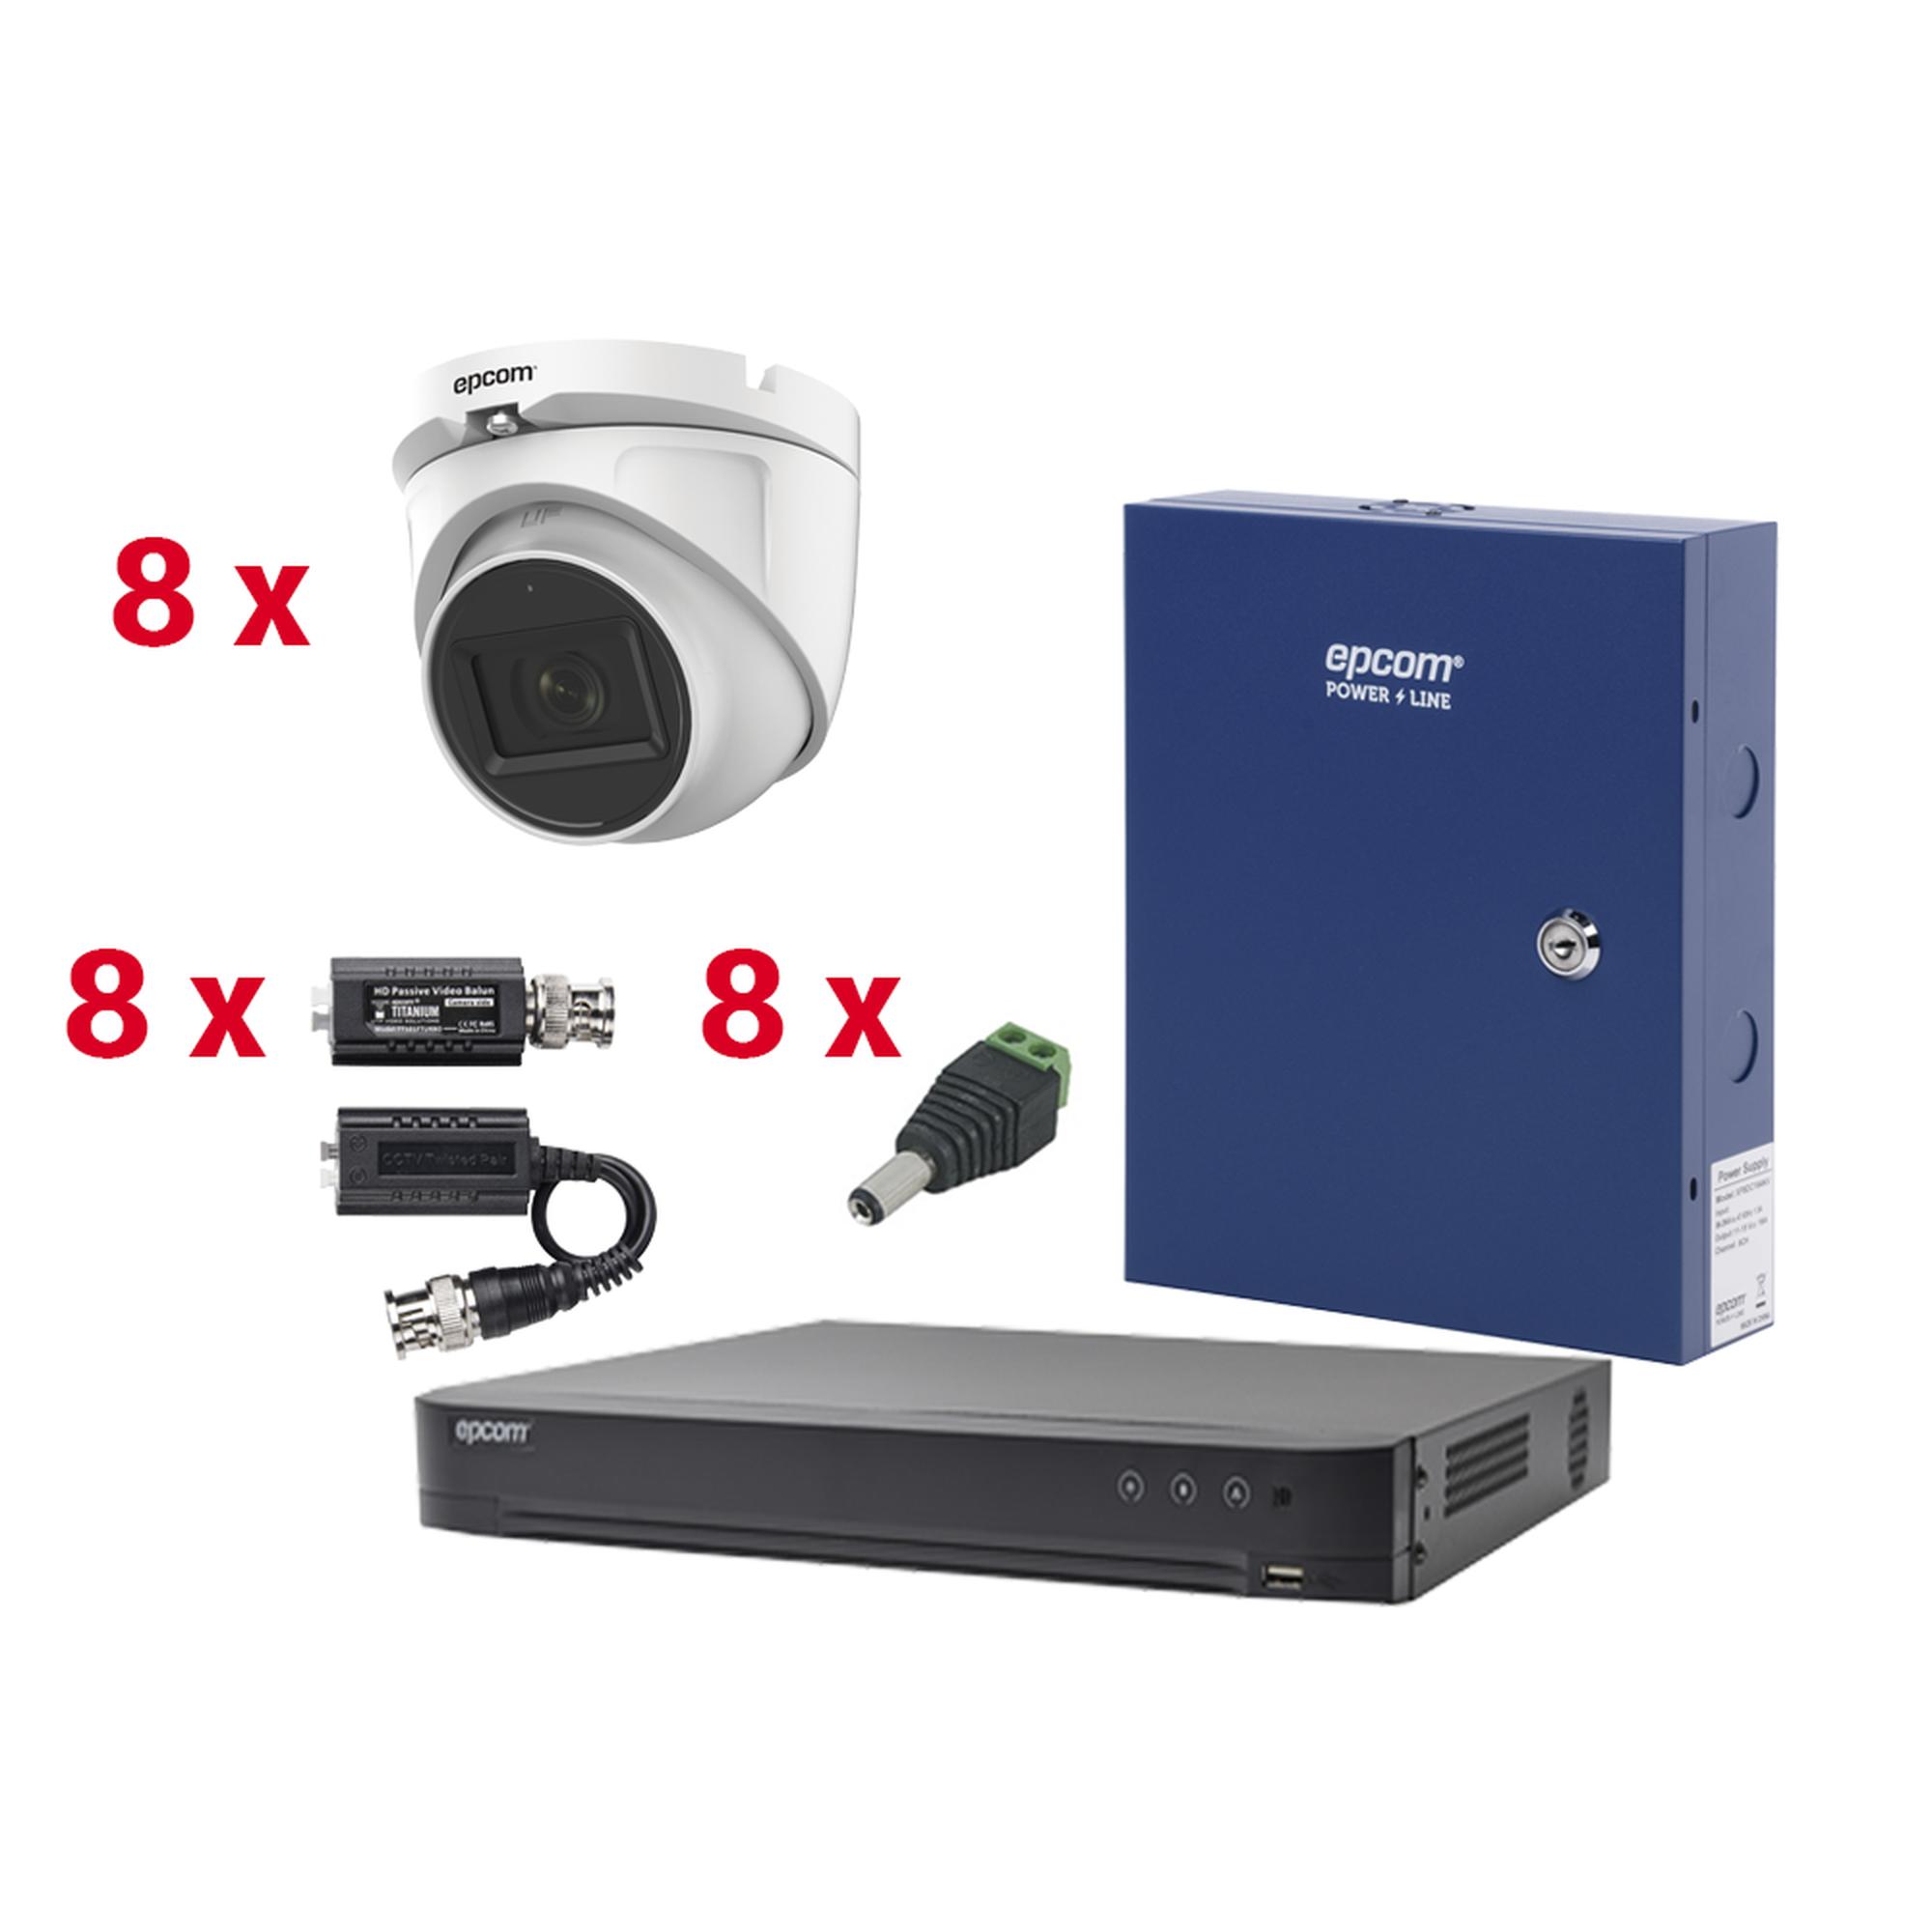 KIT TurboHD con Audio 1080p / DVR 8 Canales / 8 Cámaras Domo (exterior 2.8 mm) / Transceptores / Conectores / Fuente de Poder / AUDIO POR COAXITRON